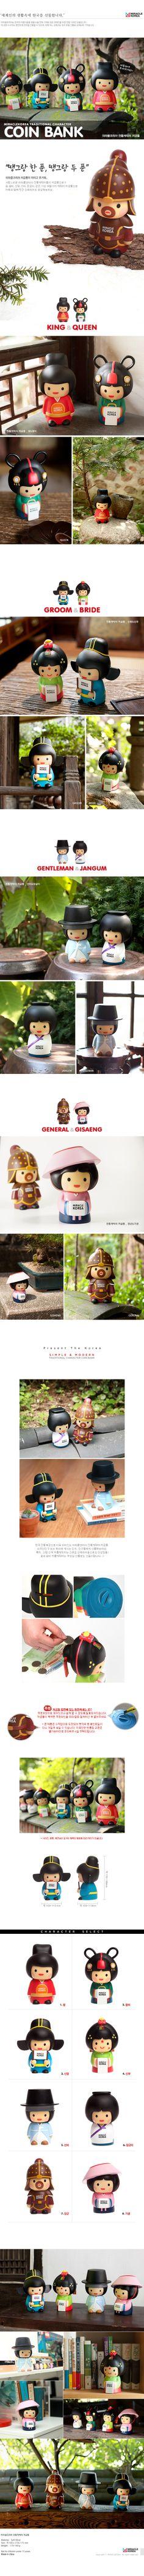 :: MIRACLE KOREA :: Simple & Modern Traditional Korea Souvenir Goods